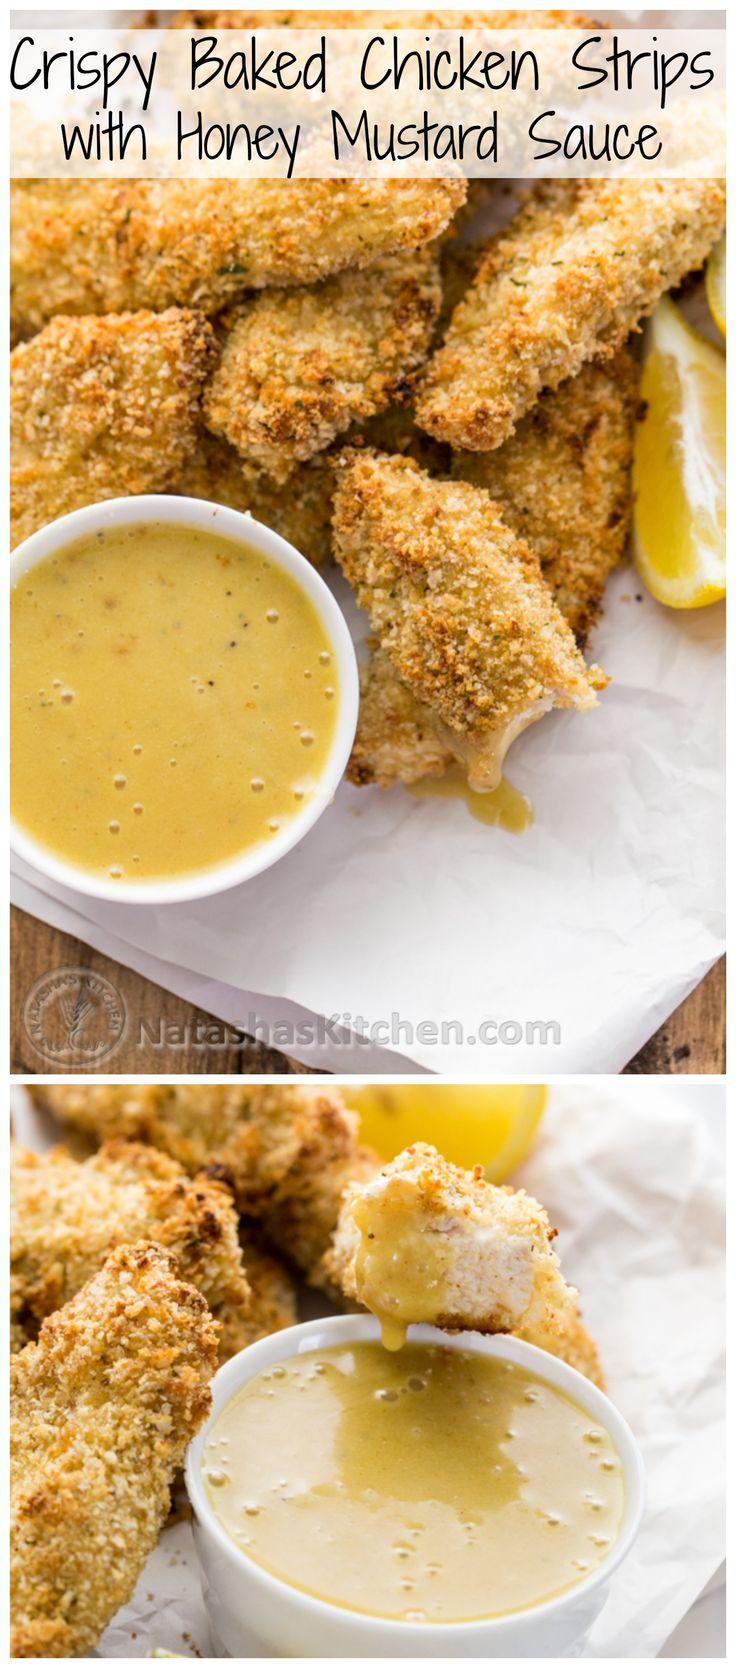 Crisp Baked Breaded Chicken Strips Recipe with Honey Mustard Dip @NatashasKitchen